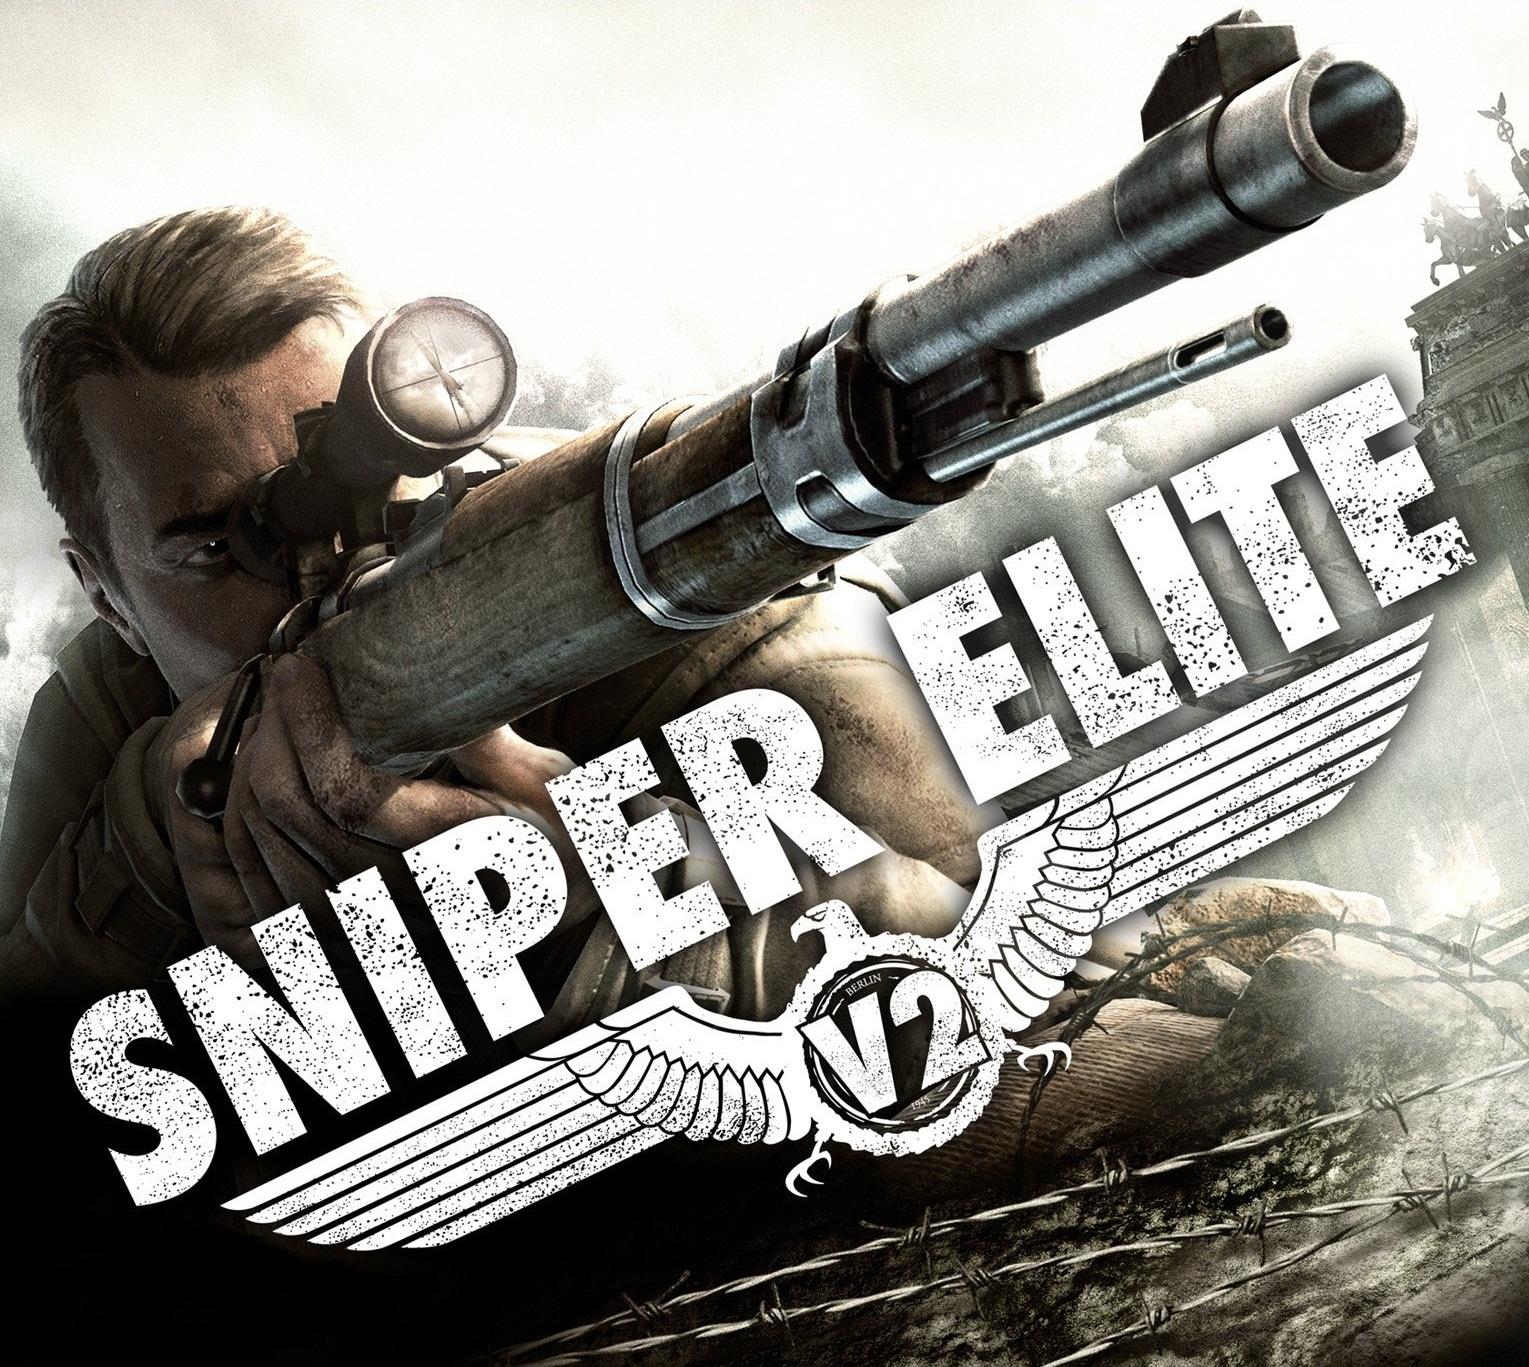 http://1.bp.blogspot.com/-JYWnekAuR8s/UEUuoTcApbI/AAAAAAAAAII/Vm9-kEKOcgc/s1600/Sniper%2BElite%2BV2%2BLogo%2BBig.jpg